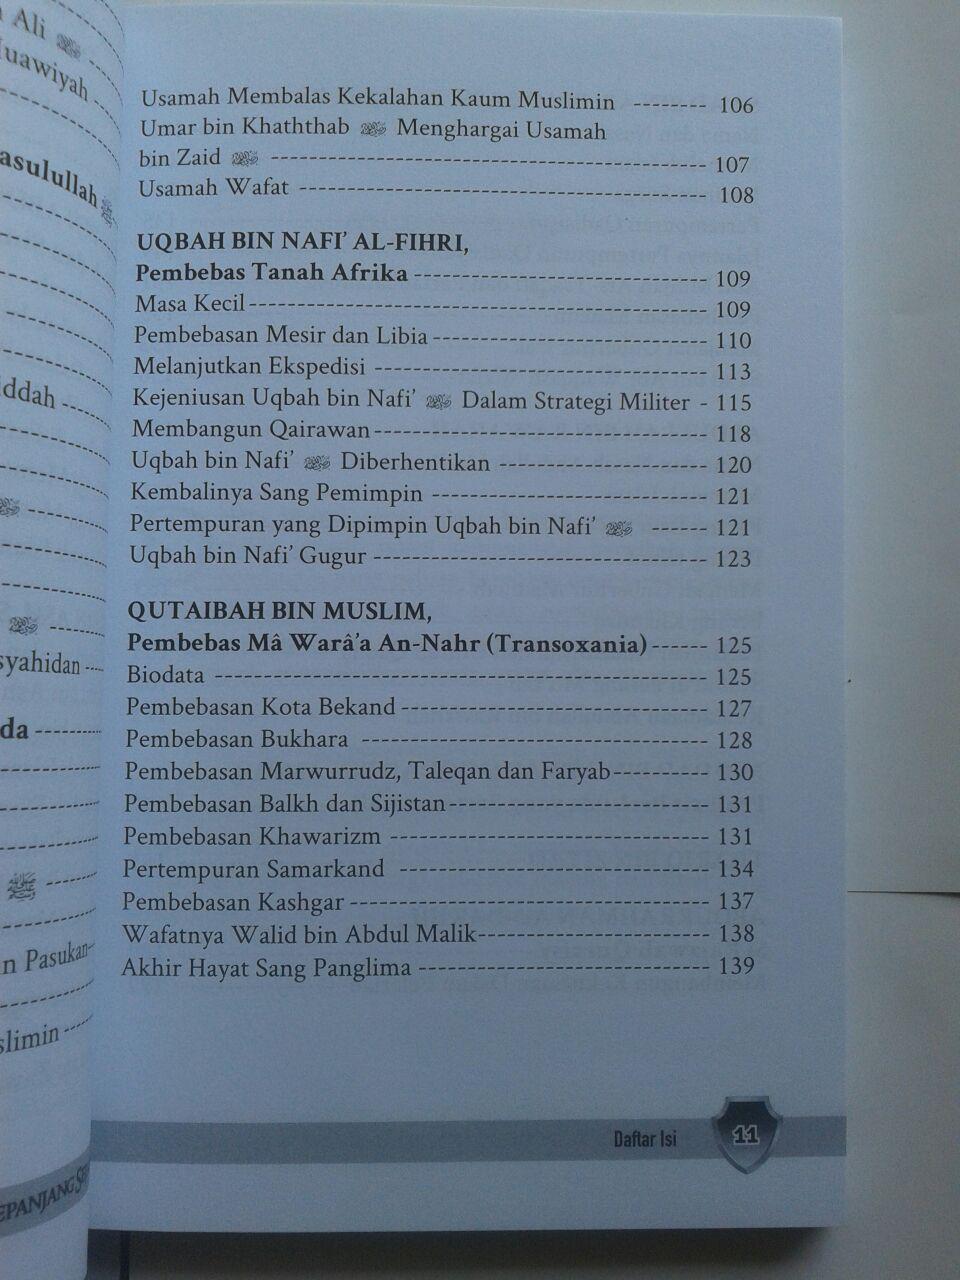 Buku Jenderal Islam Paling Berpengaruh Sepanjang Sejarah isi 3